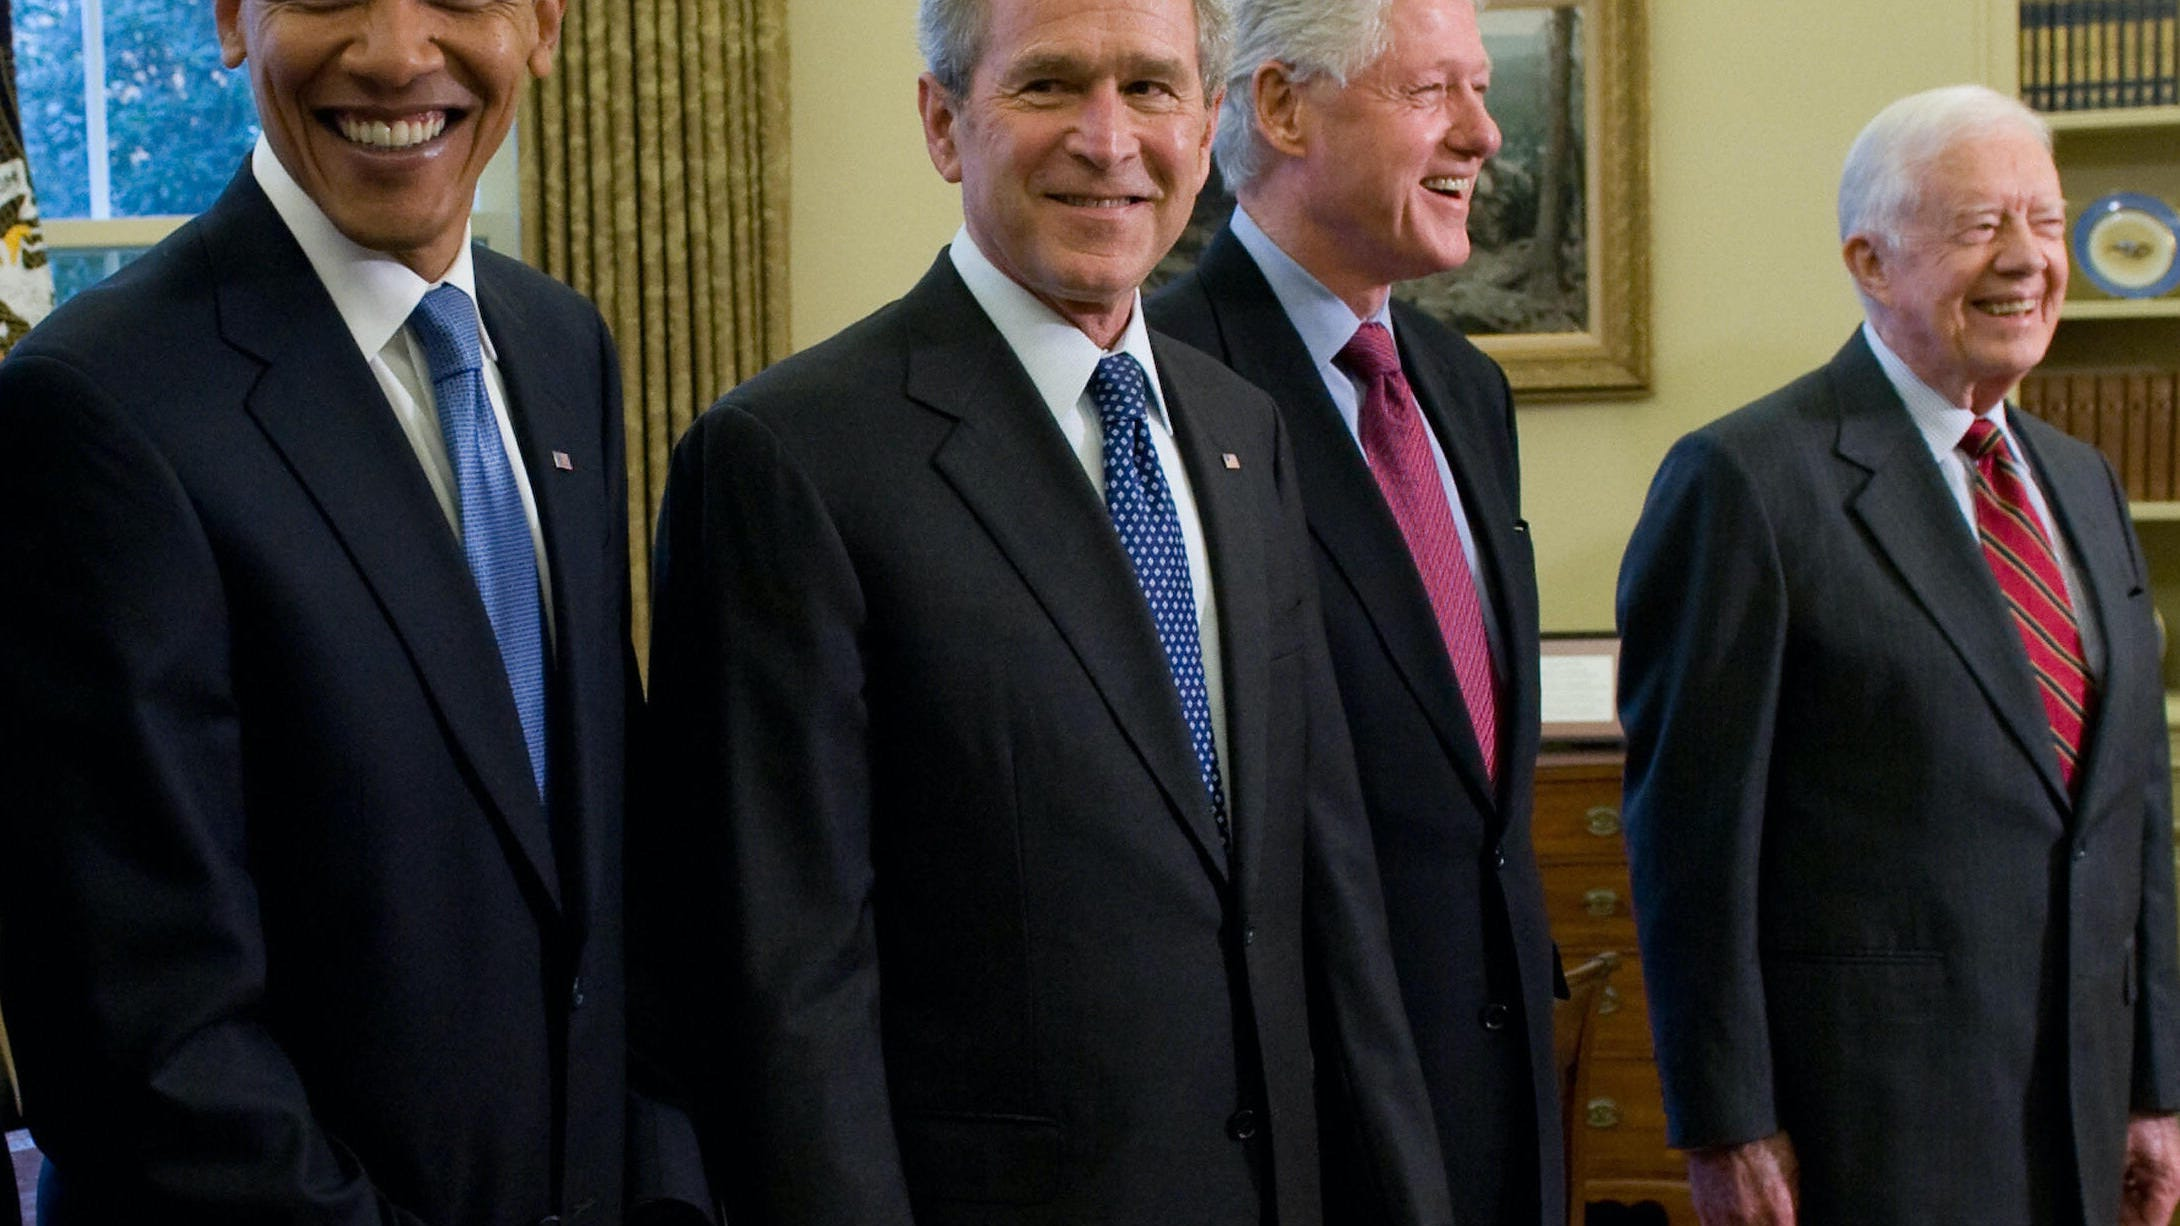 WATCH: Obama, Bush, Clinton, Carter team up for COVID-19 vaccine PSA